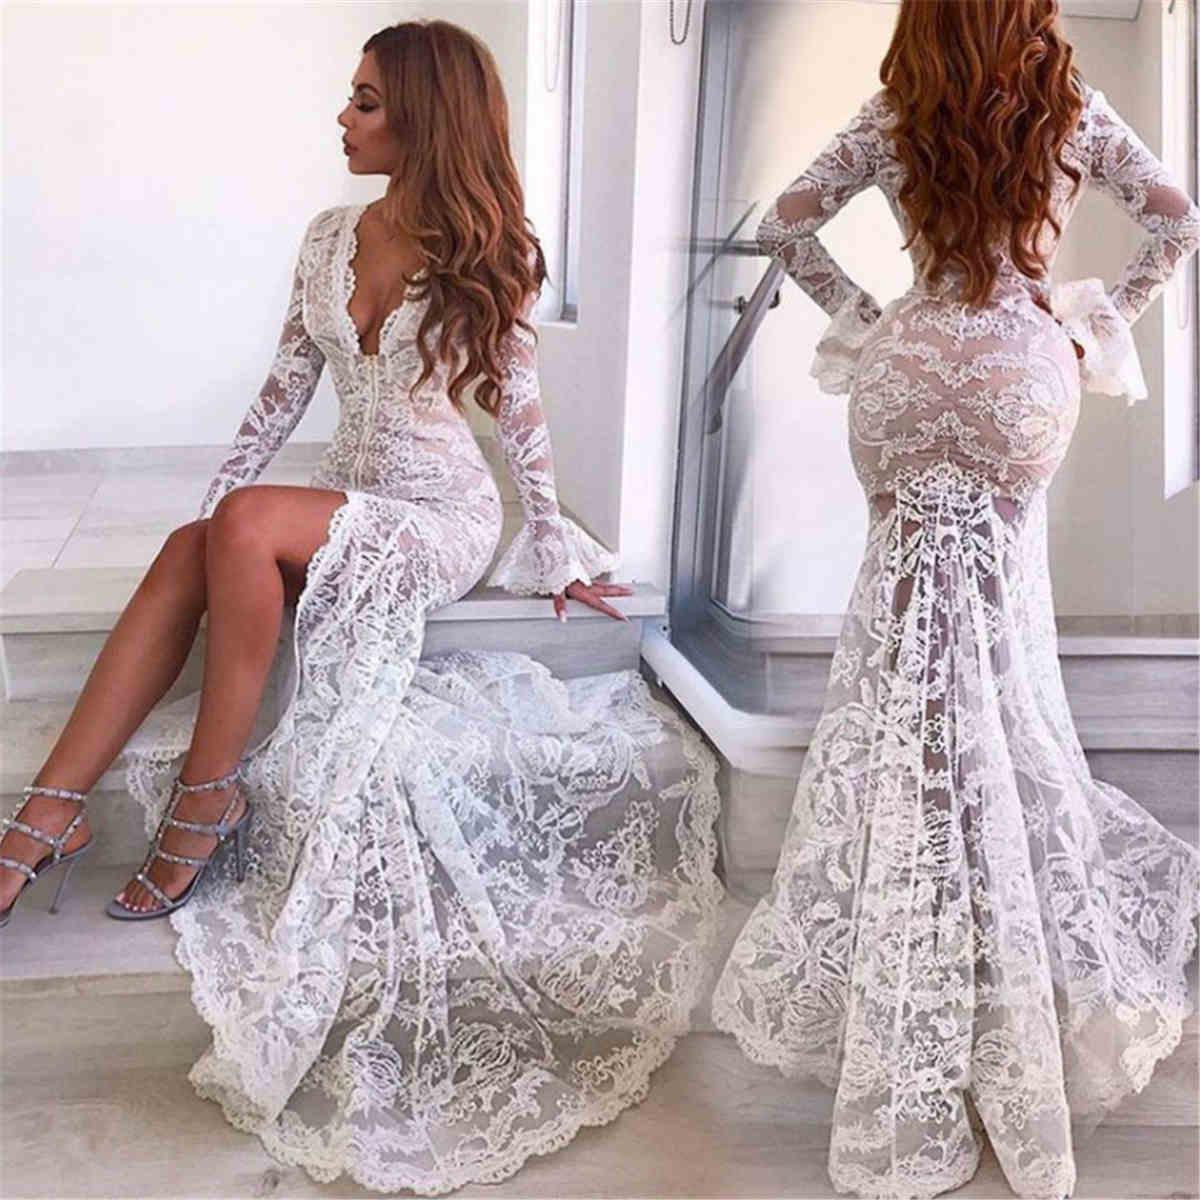 White Lace Mermaid Gown: Women Deep V-neck Long Sleeve White Lace Mermaid Wedding